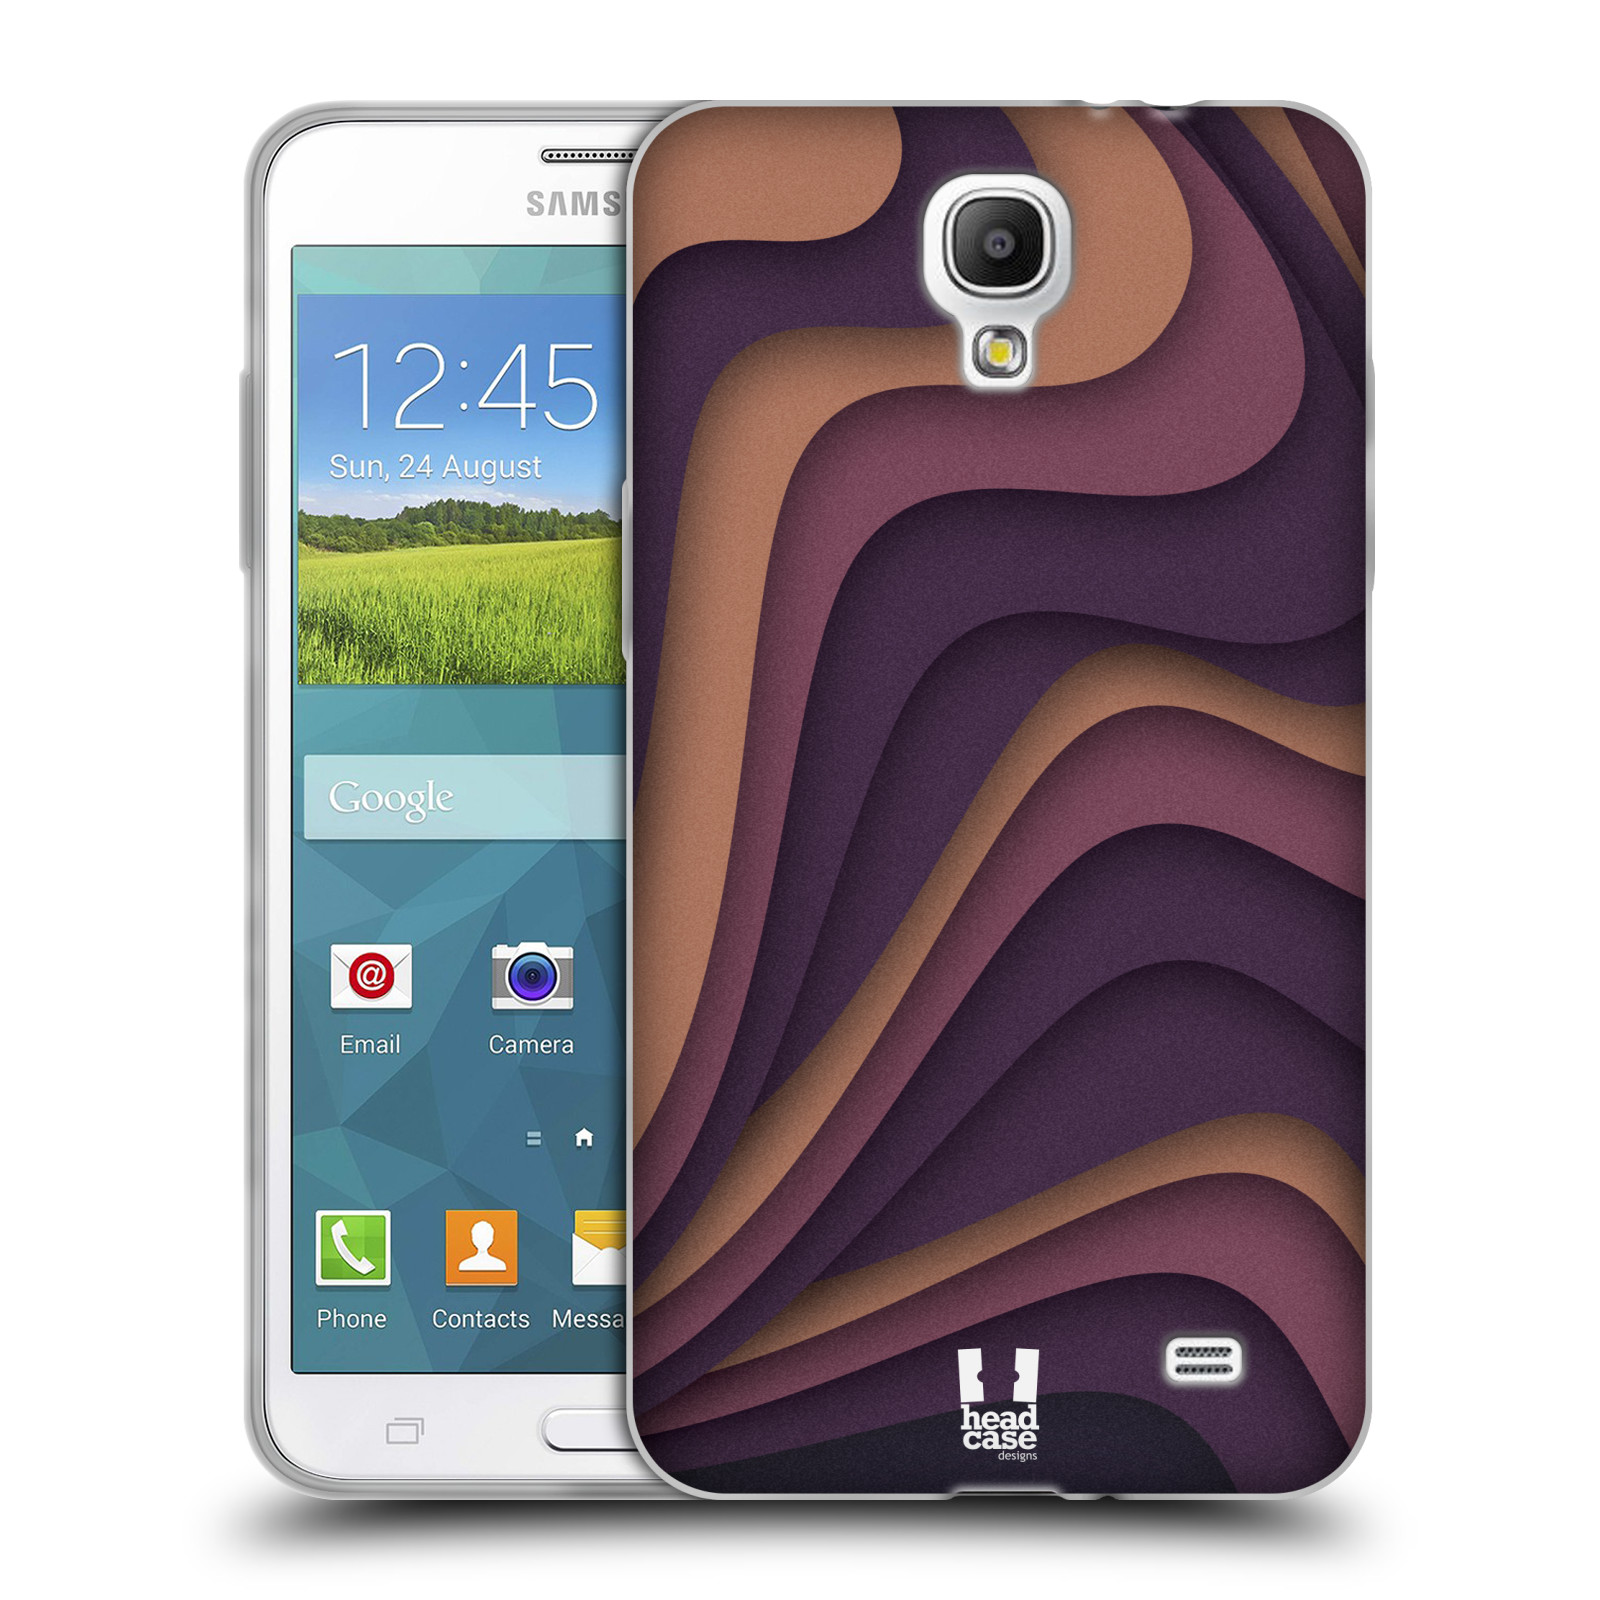 HEAD-CASE-DESIGNS-COLOURFUL-PAPER-ART-SOFT-GEL-CASE-FOR-SAMSUNG-PHONES-4